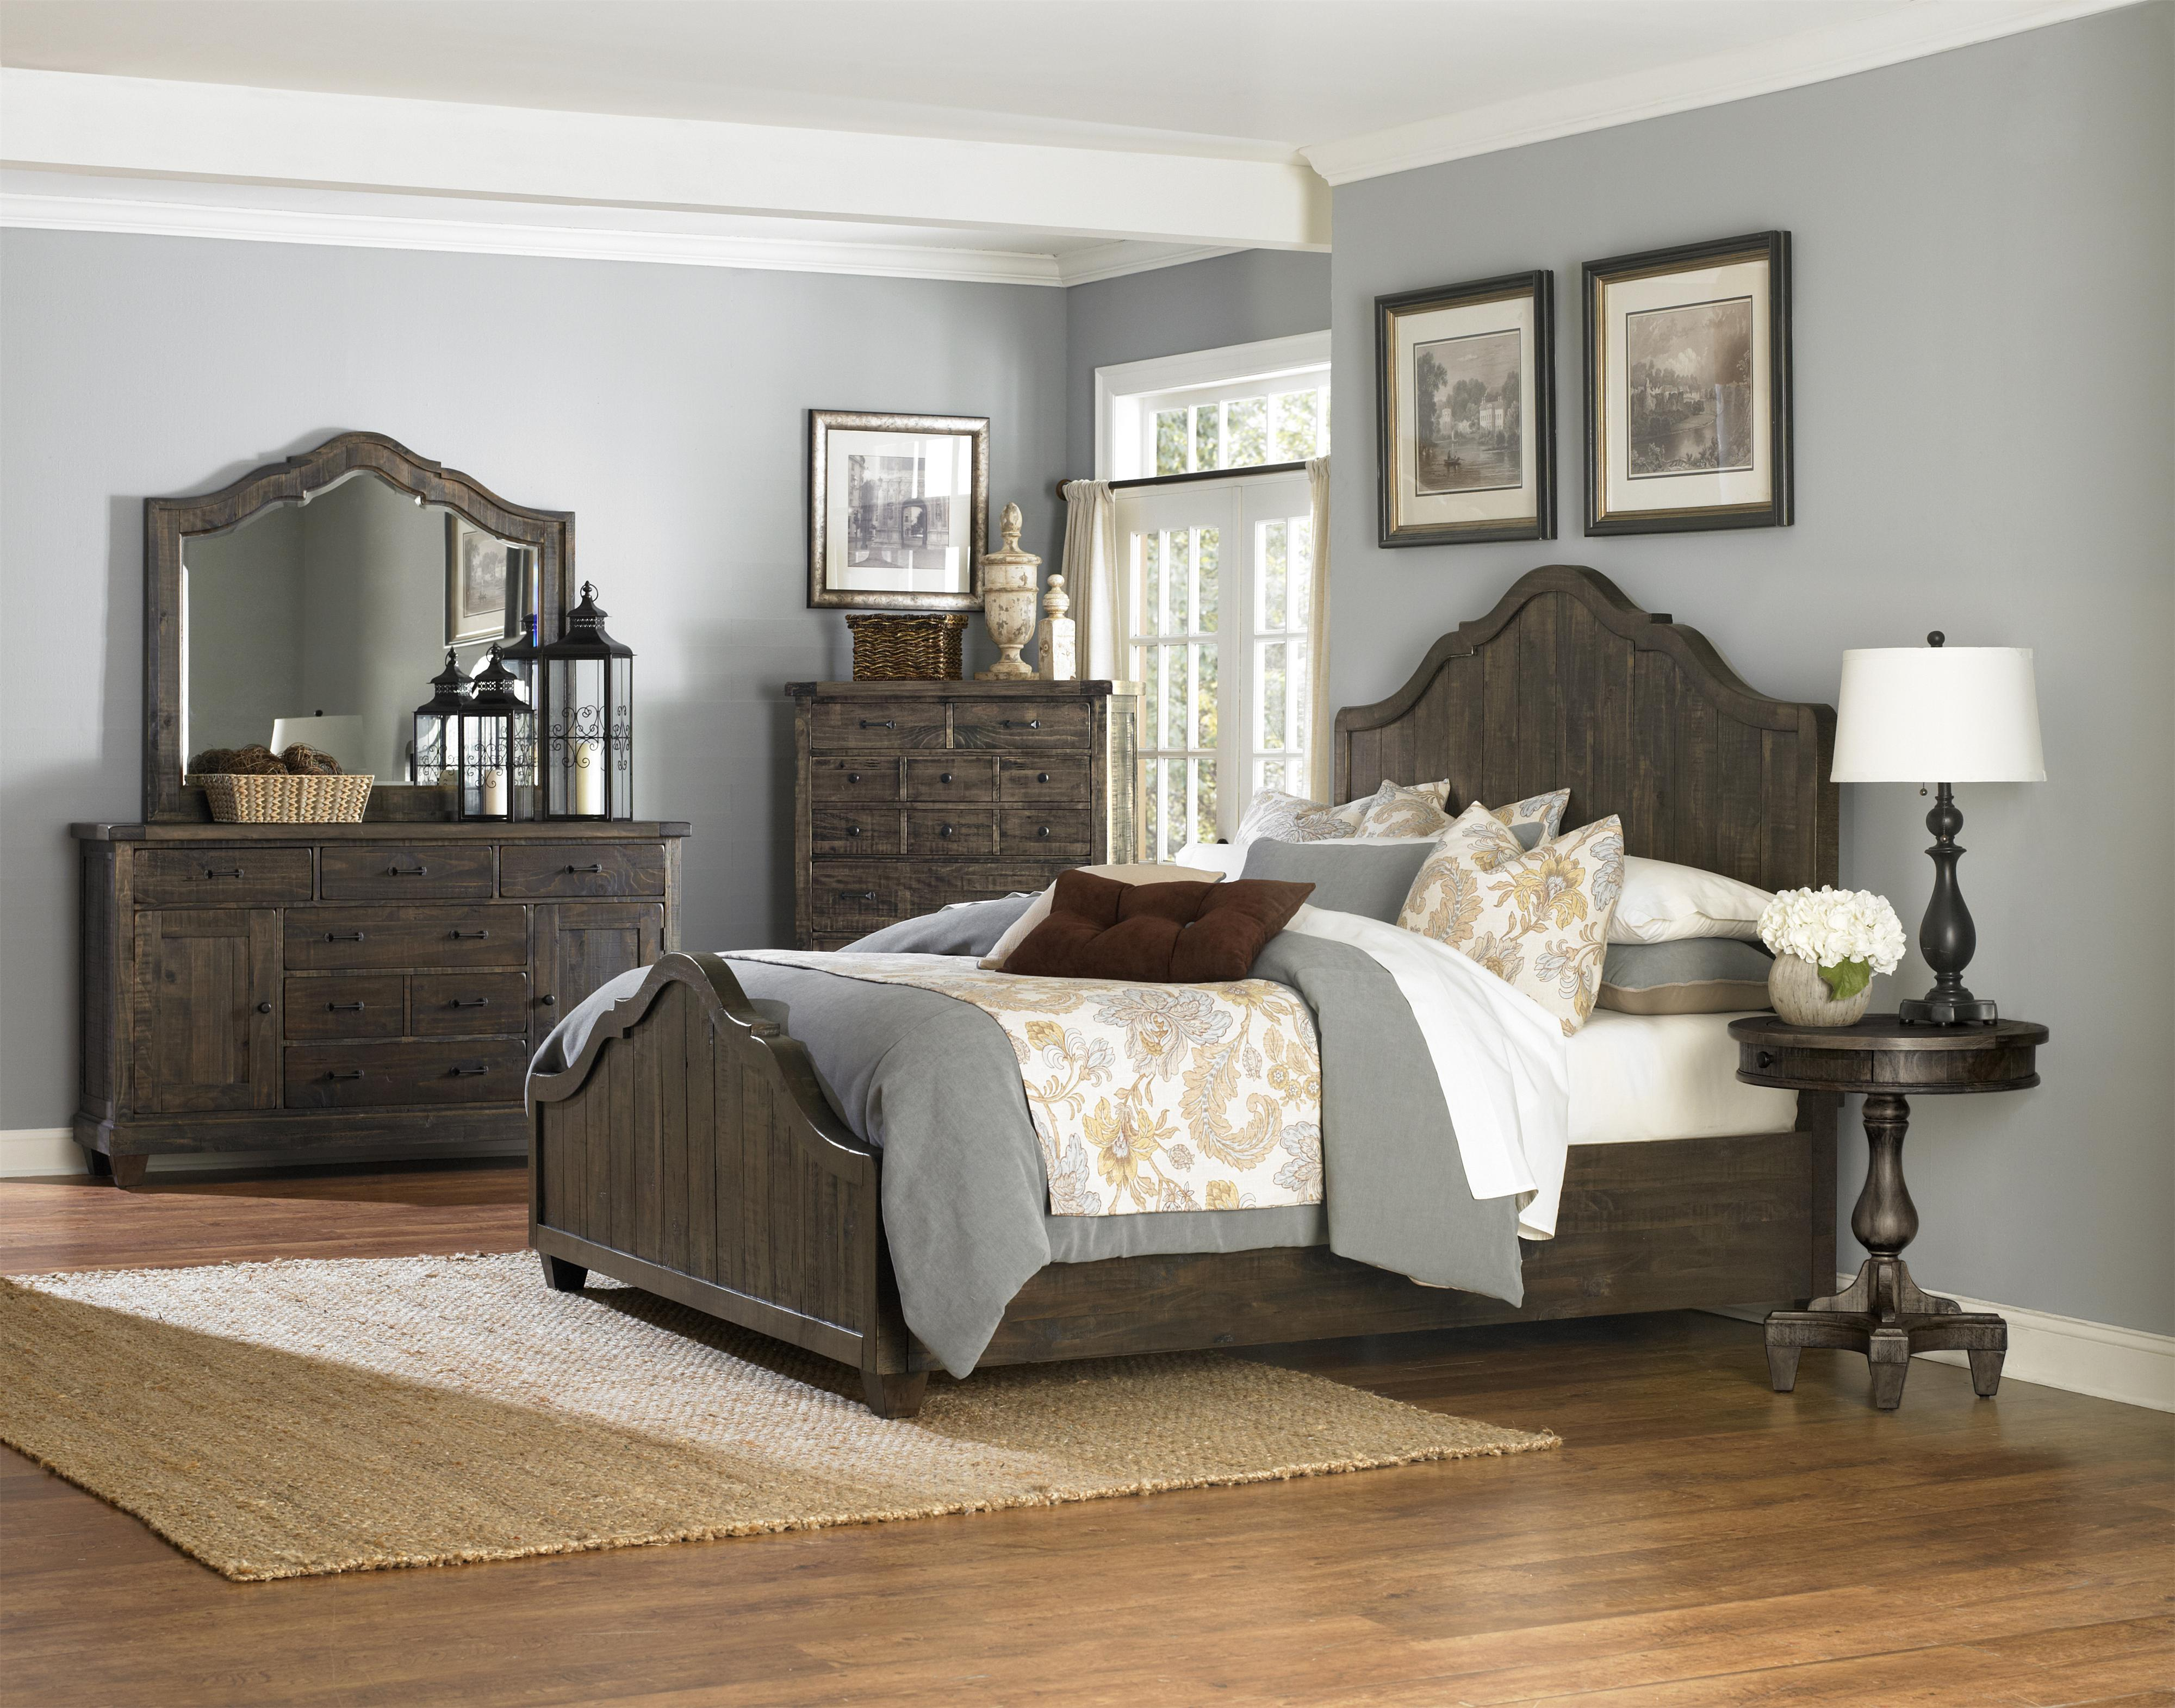 Magnussen home brenley queen bedroom group dunk bright - Bright house bedroom furniture ...